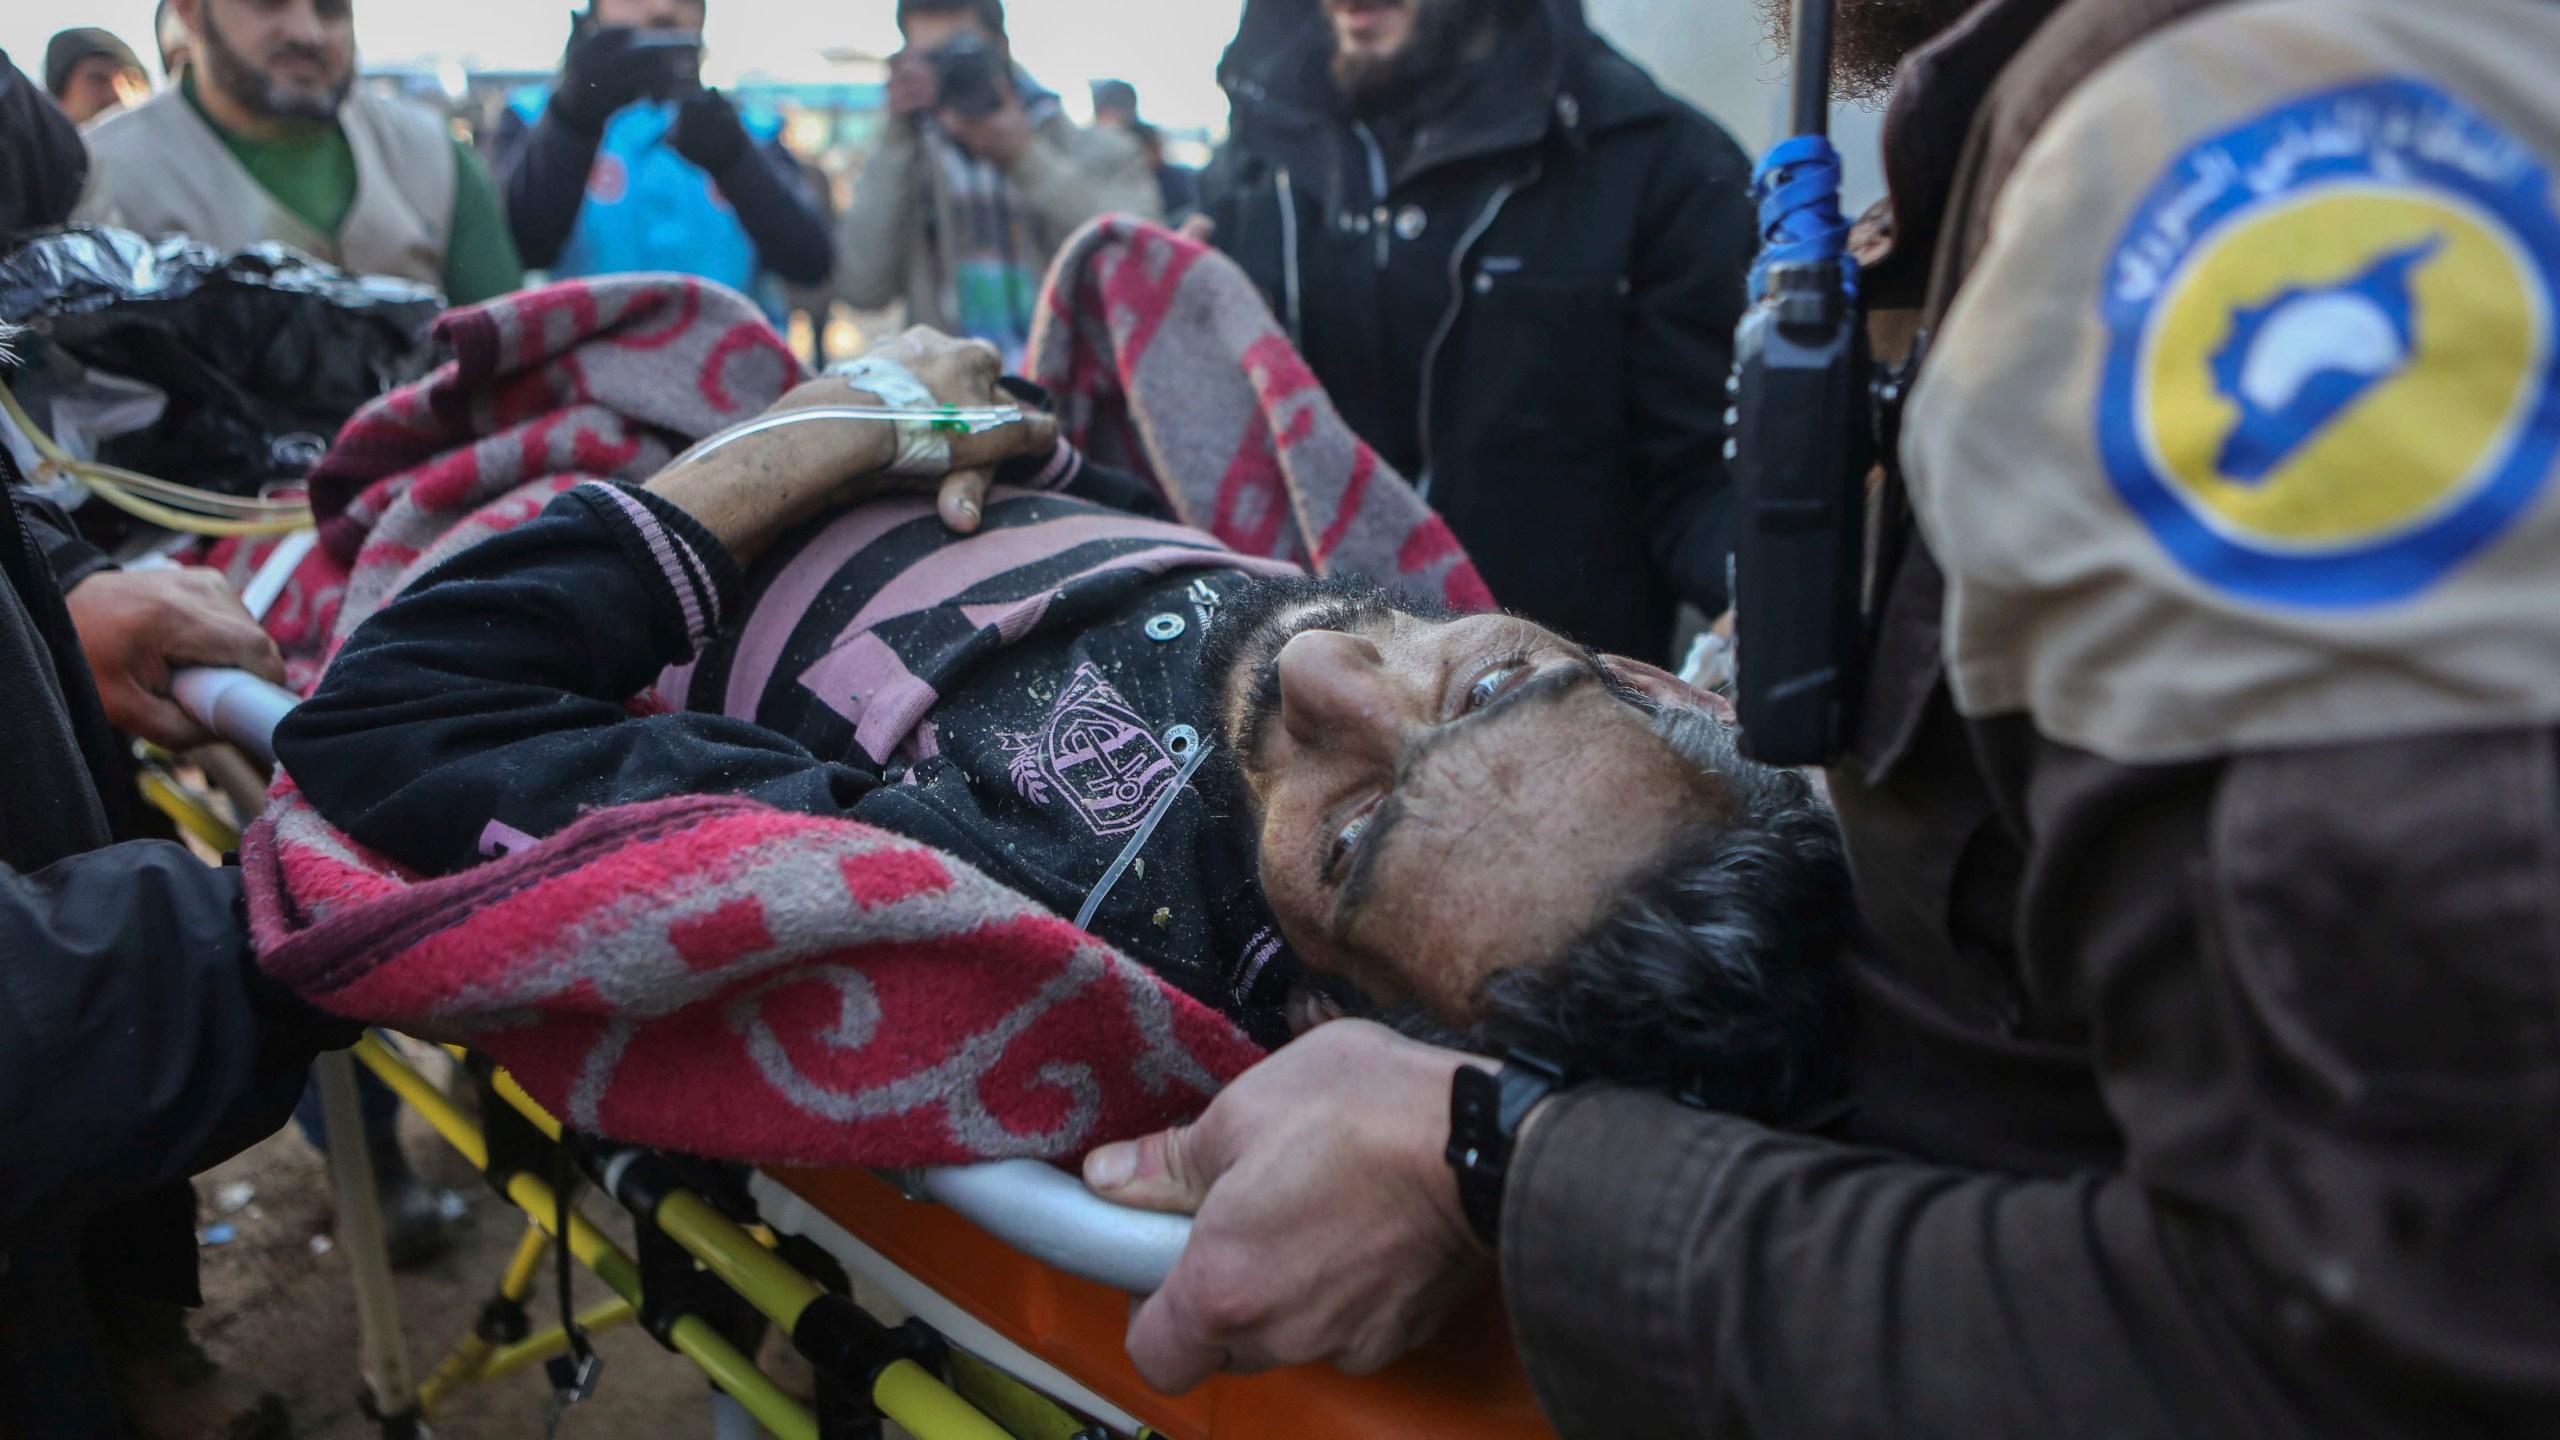 FILE PHOTO Syria Russia Turkey Aleppo 12202016 Photo by AP Photo_258109